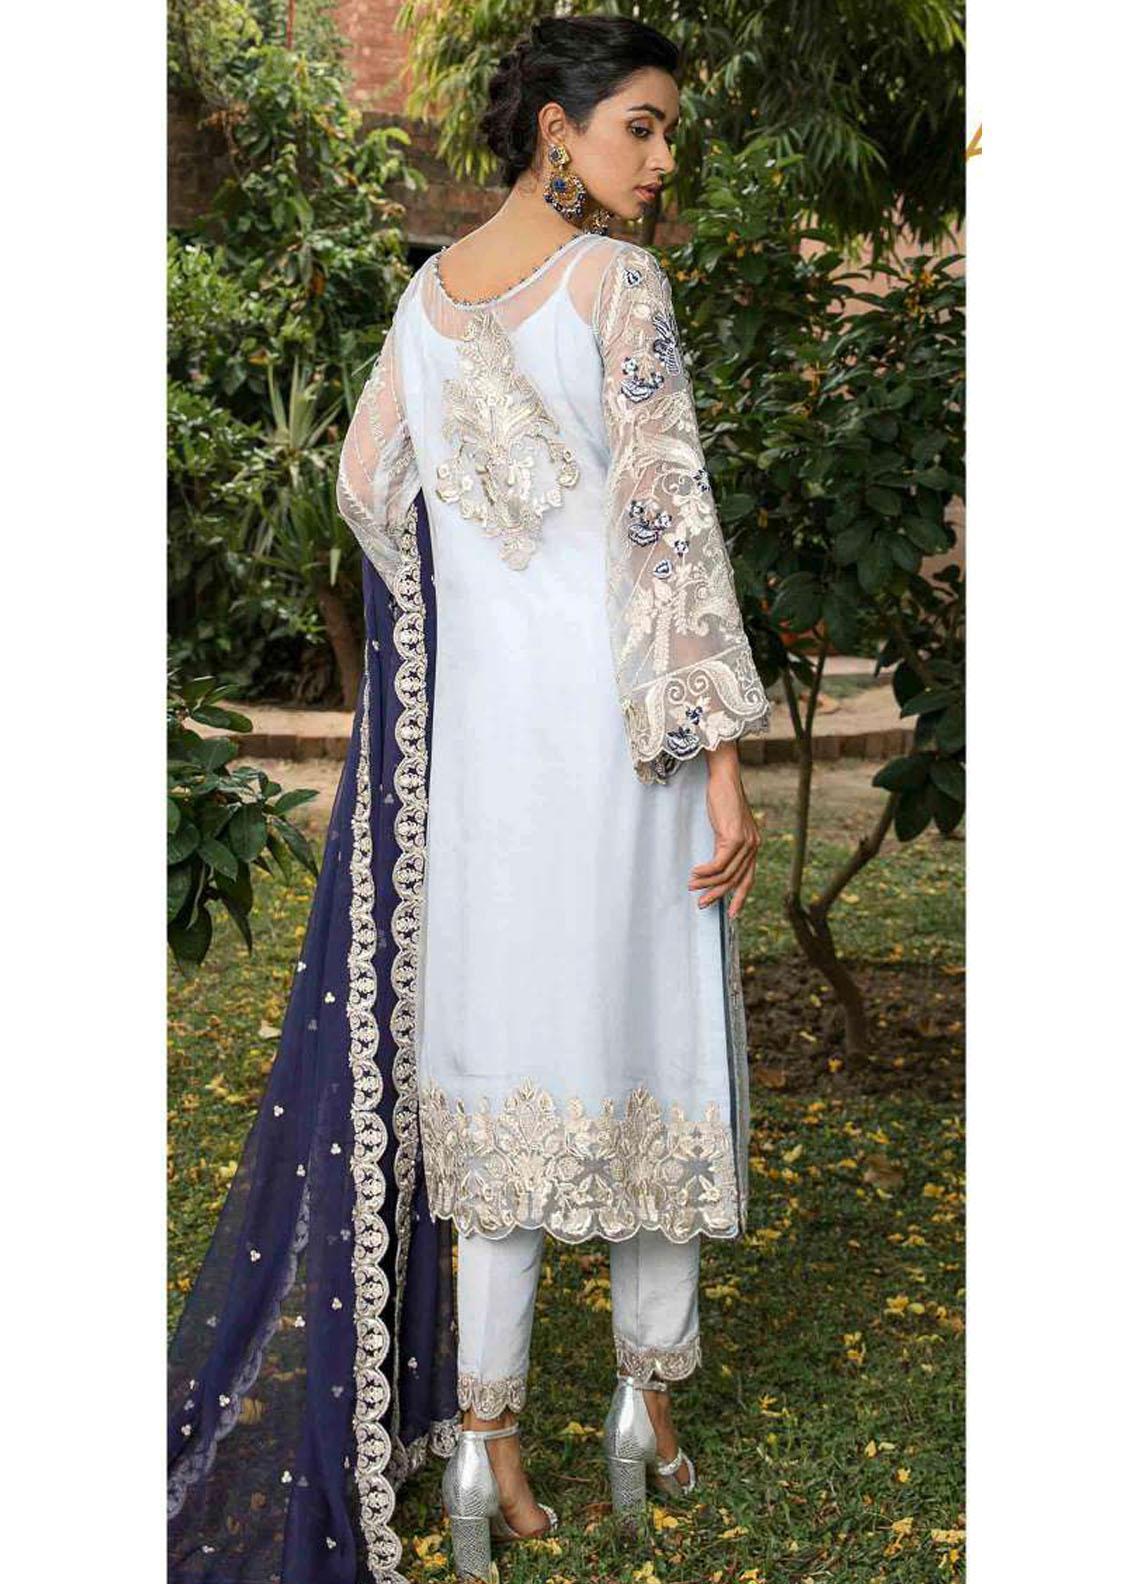 Suraj Garh by Imrozia Premium Embroidered Chiffon Suit Unstitched 3 Piece I-147 SURMAI BAHAR – Wedding Collection